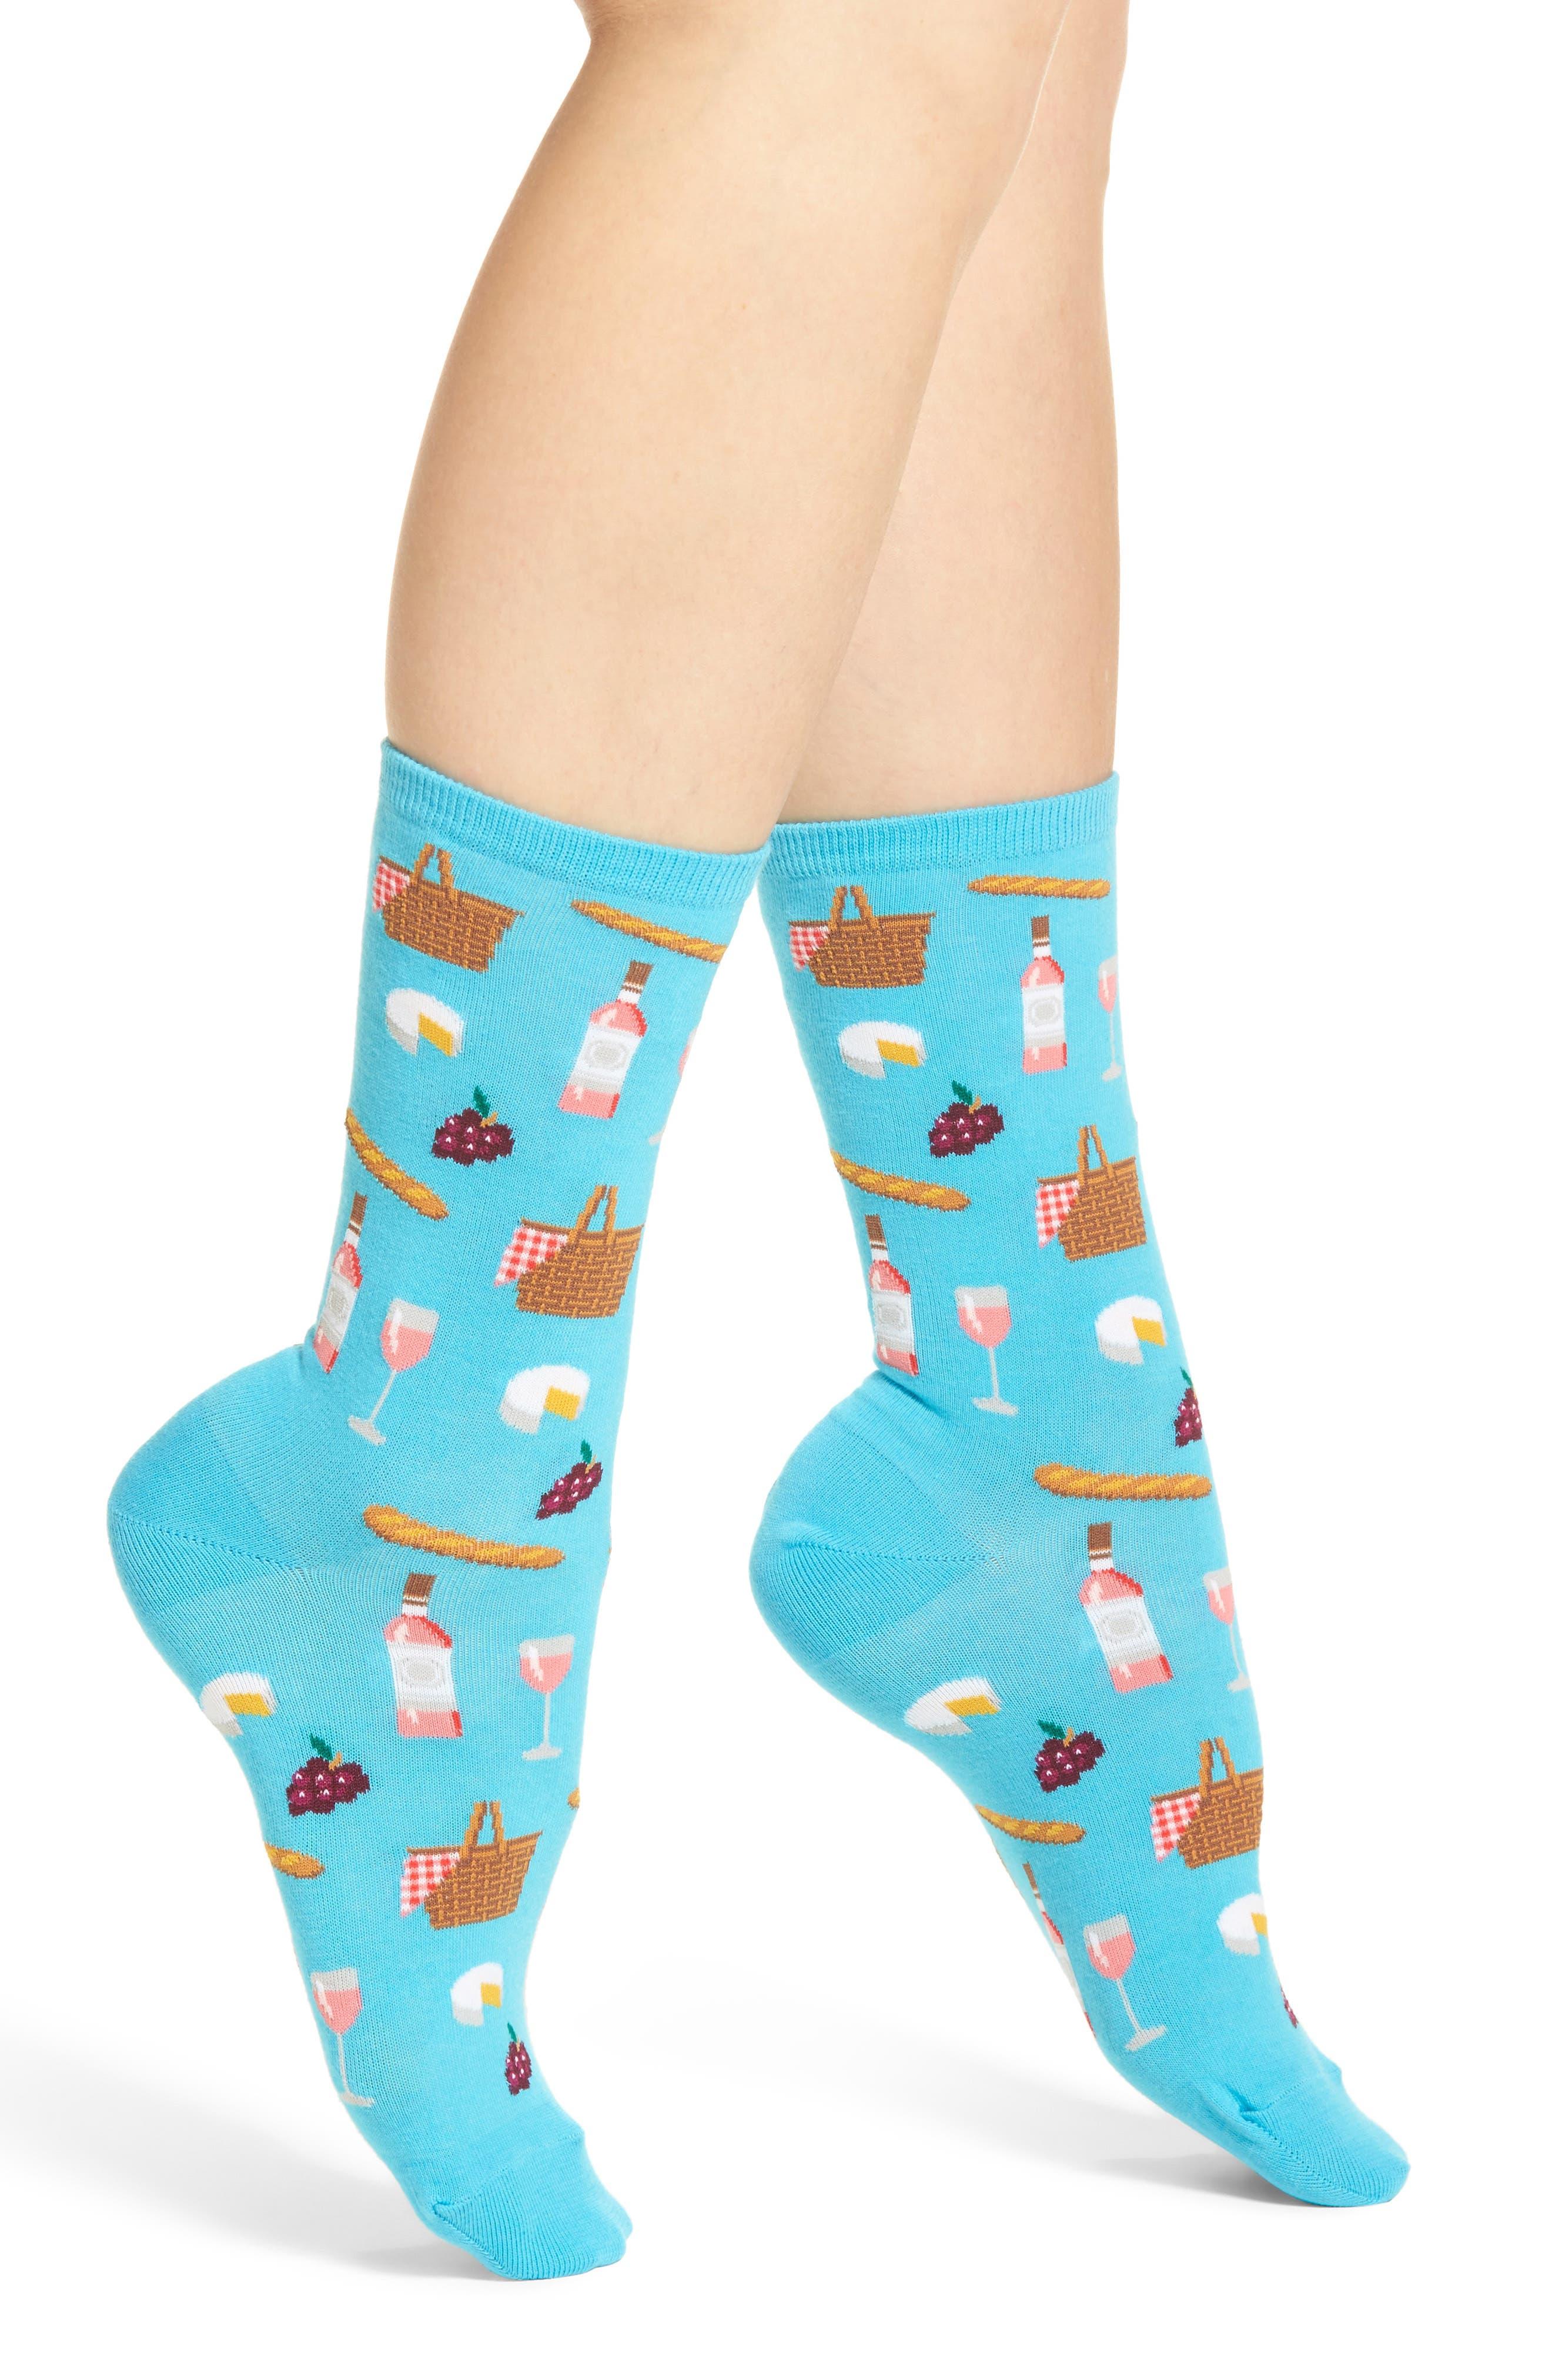 Picnic Crew Socks,                         Main,                         color, Light Blue